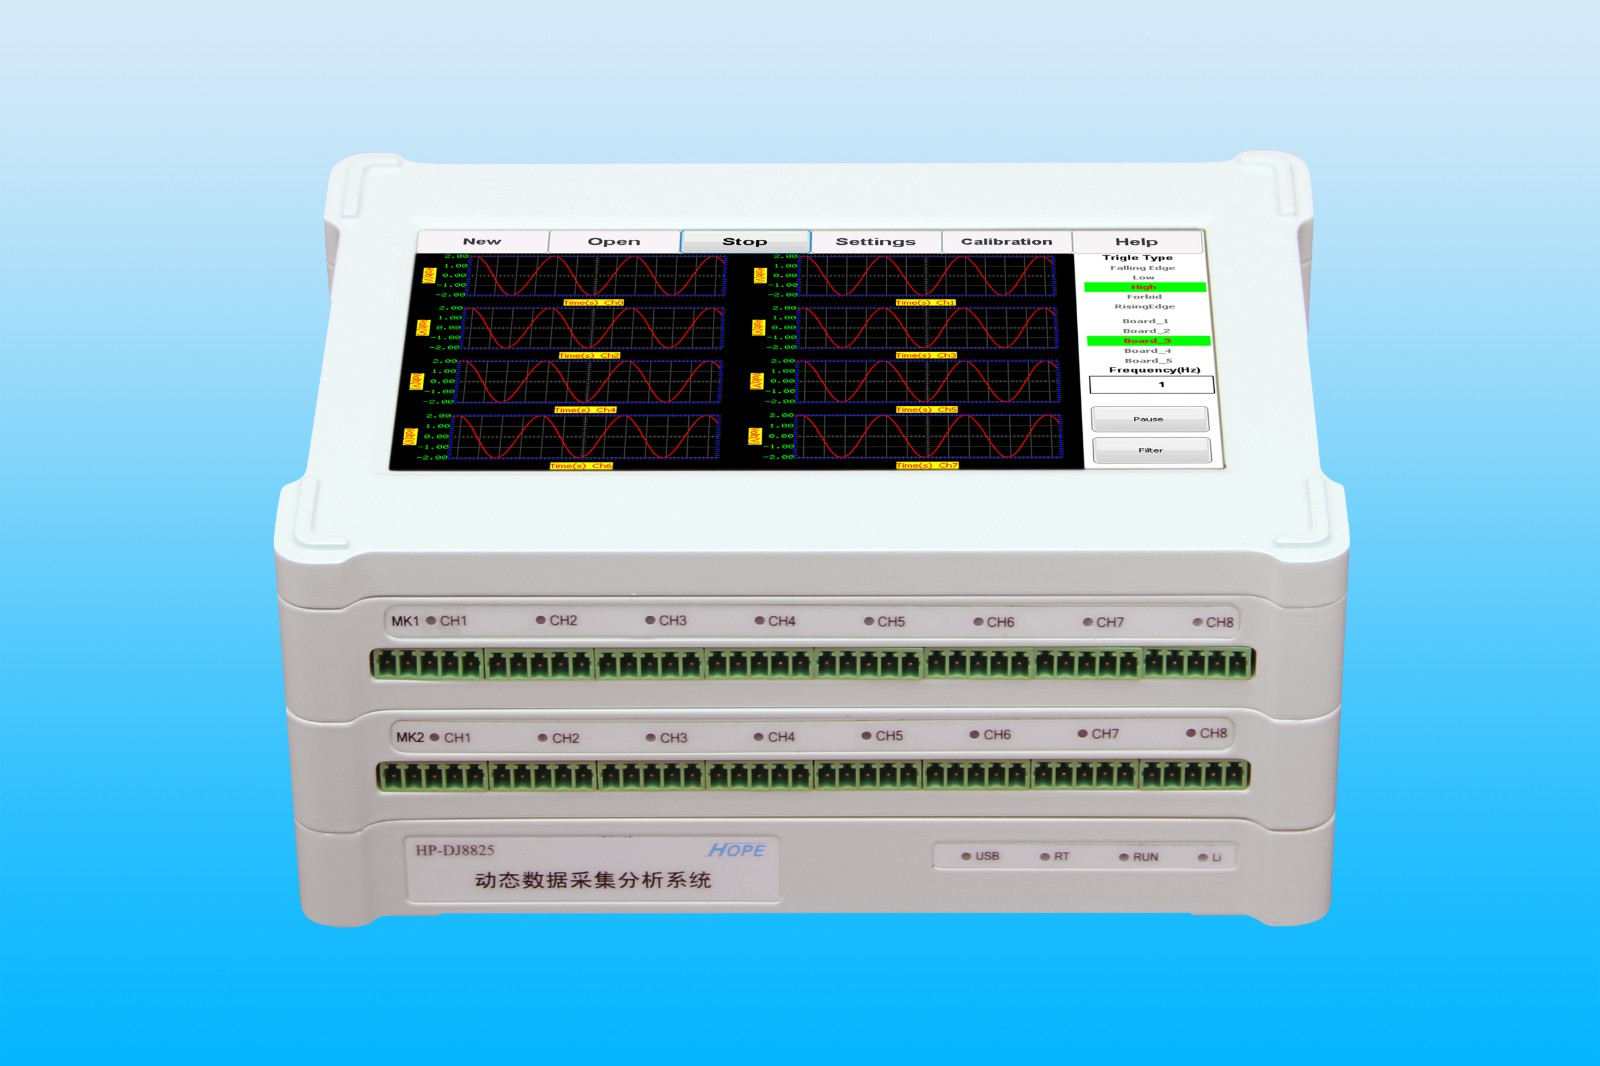 HP-DJ8225M 动态信号测试分析系统